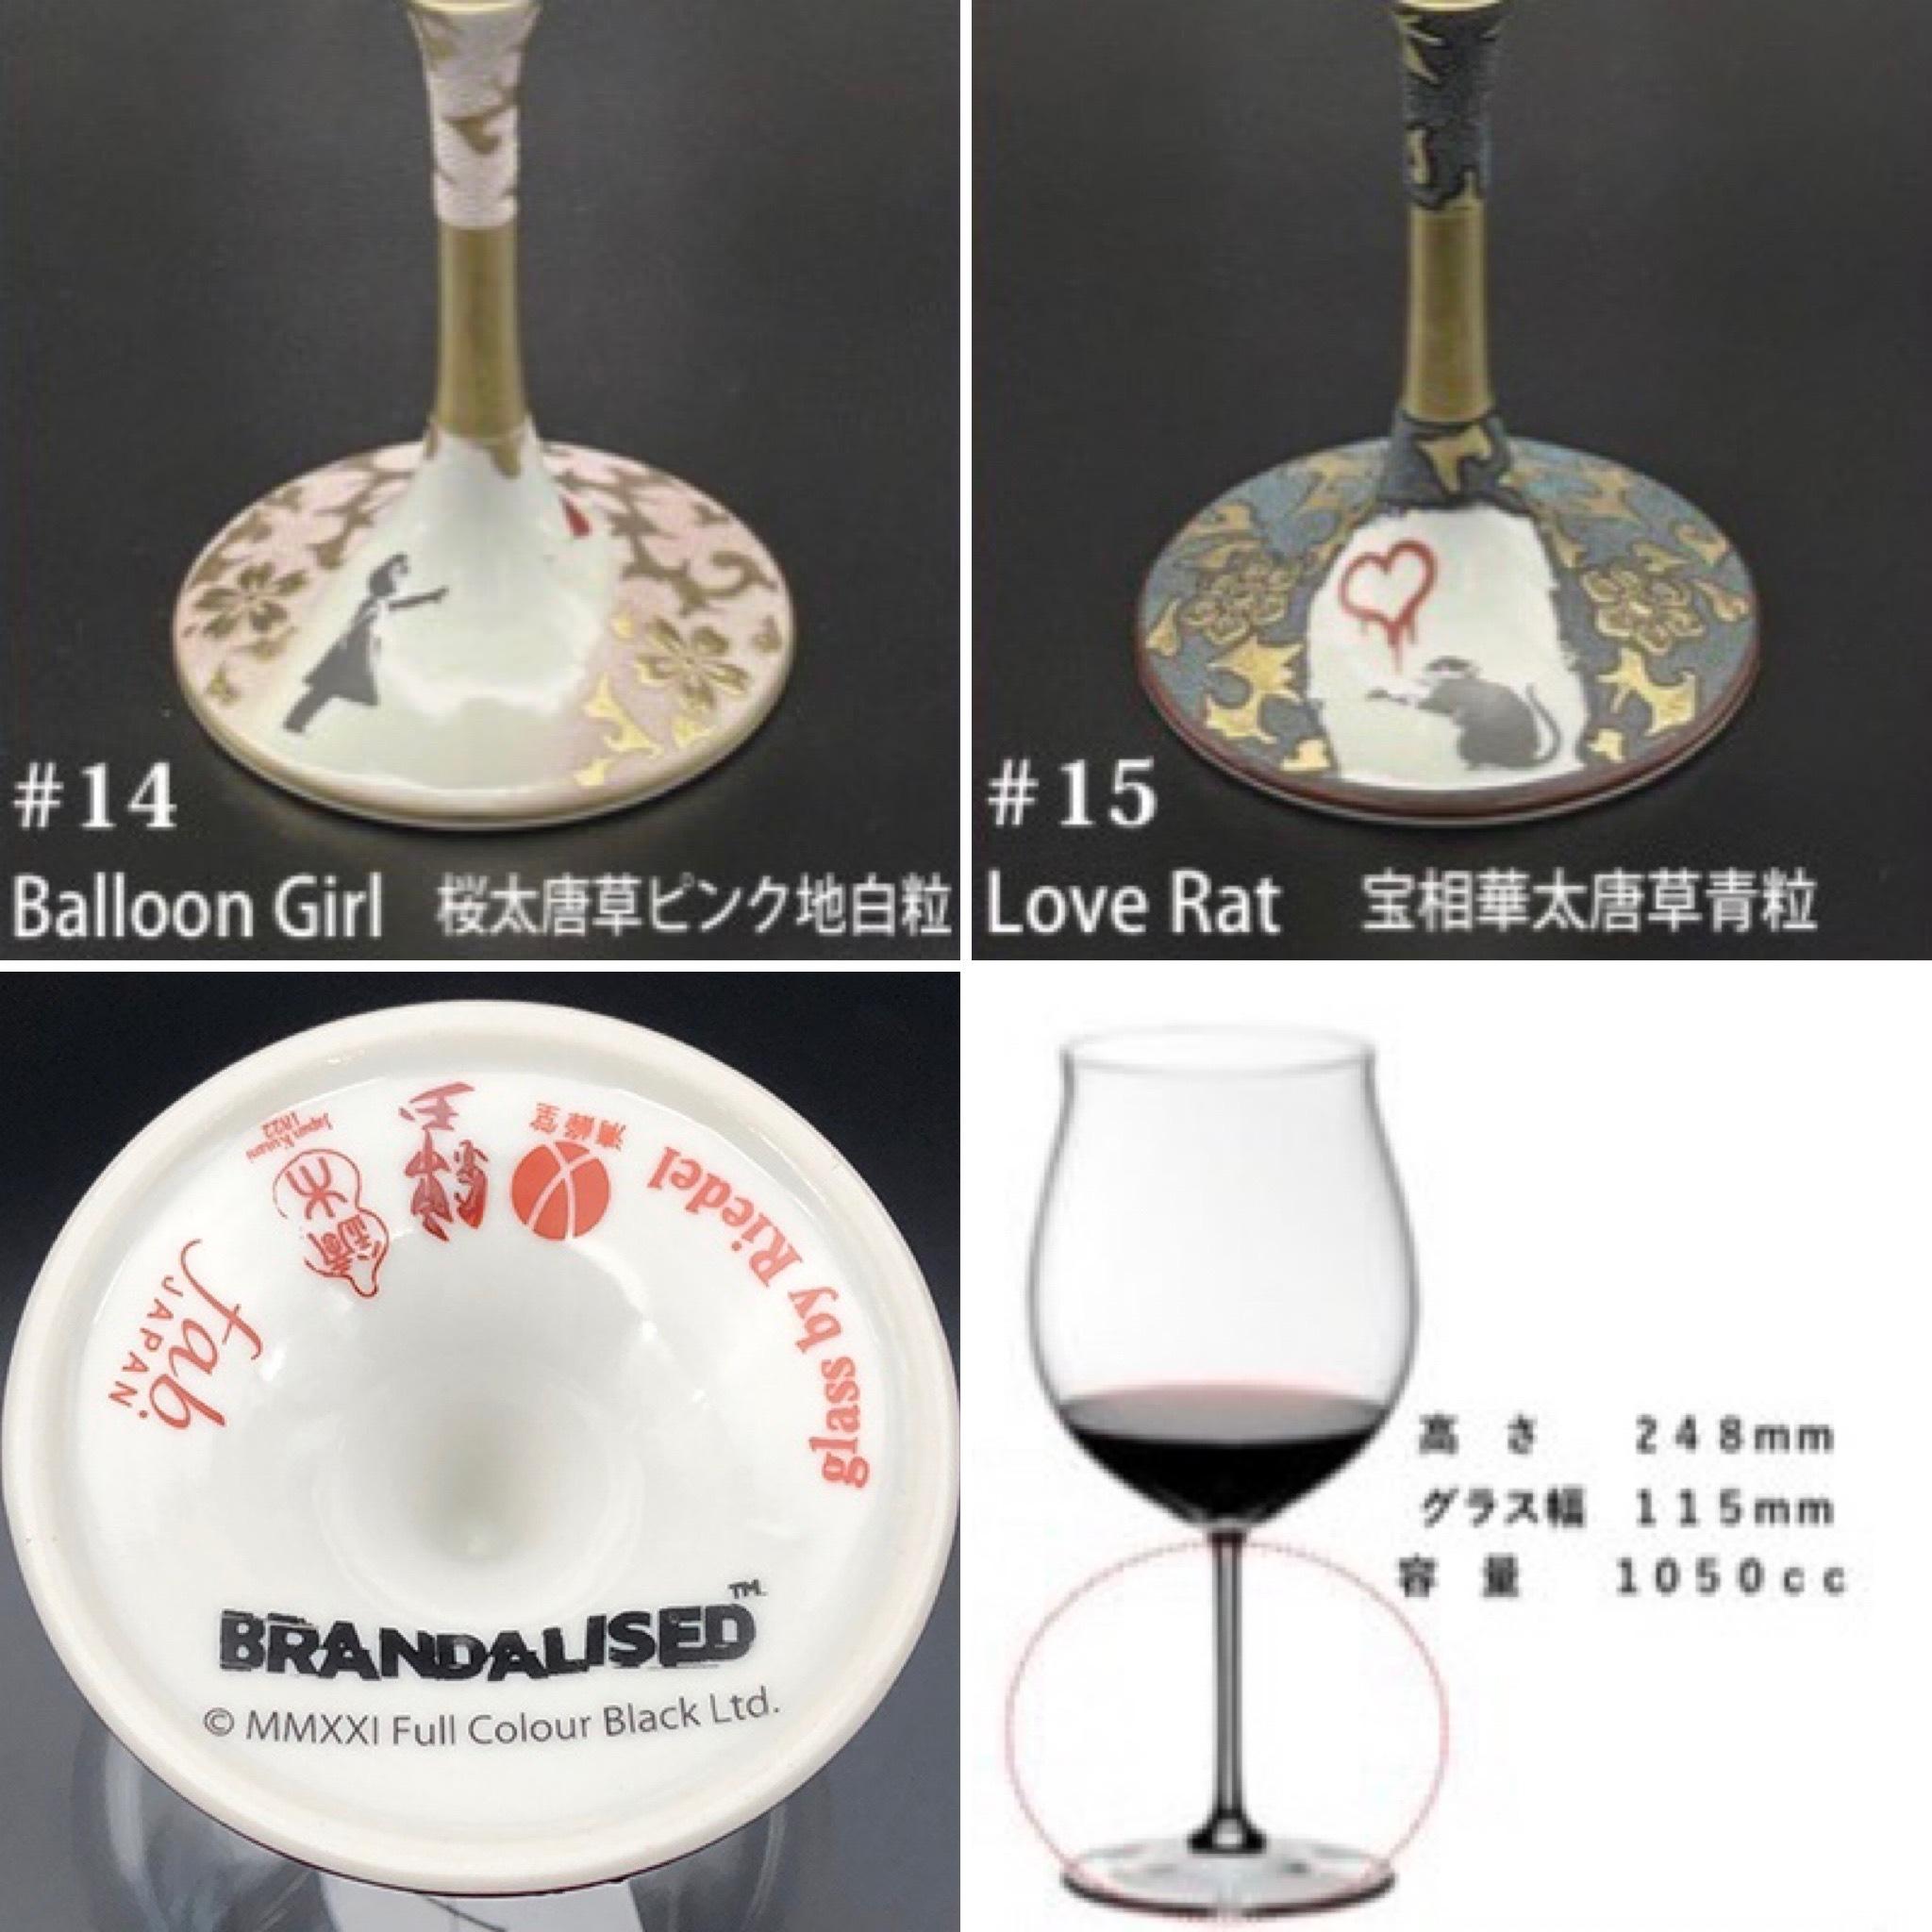 BRANDALISEDグラス / BRANDALISED(バンクシーアート)×鏑木ワイングラス(SSグラス)